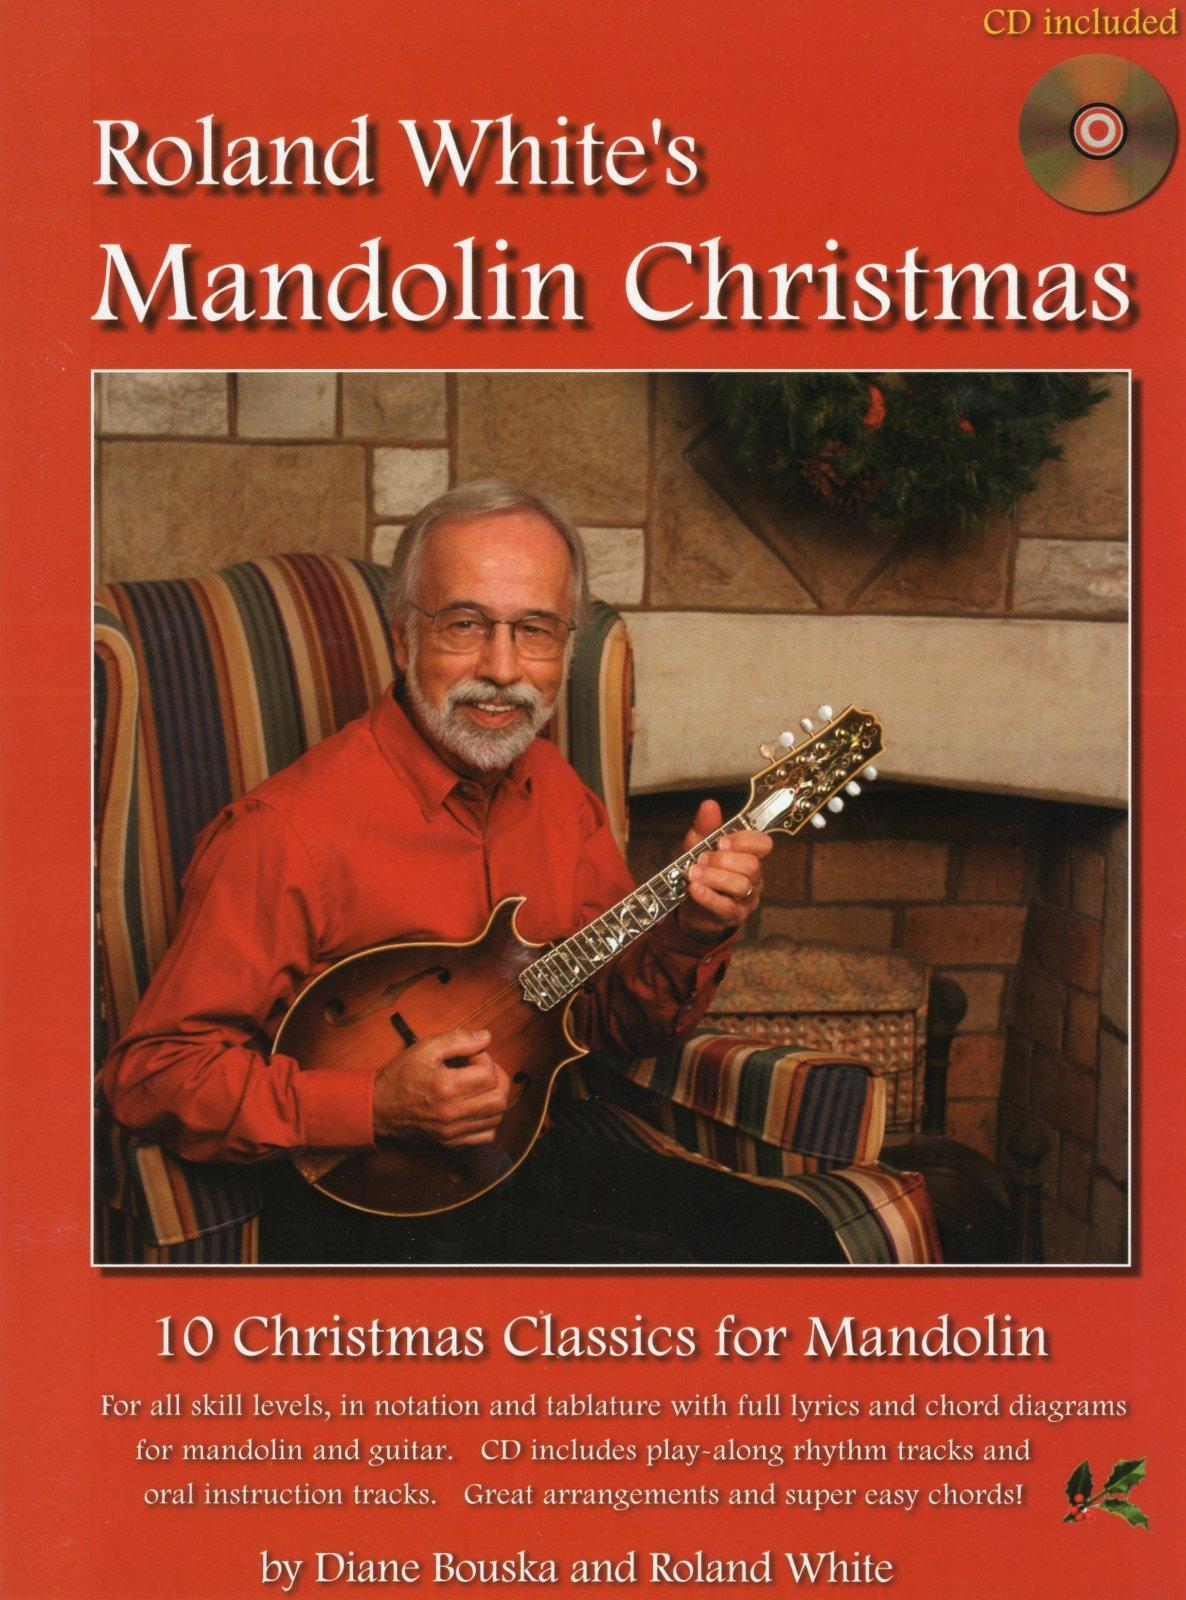 Roland White's Mandolin Christmas with CD